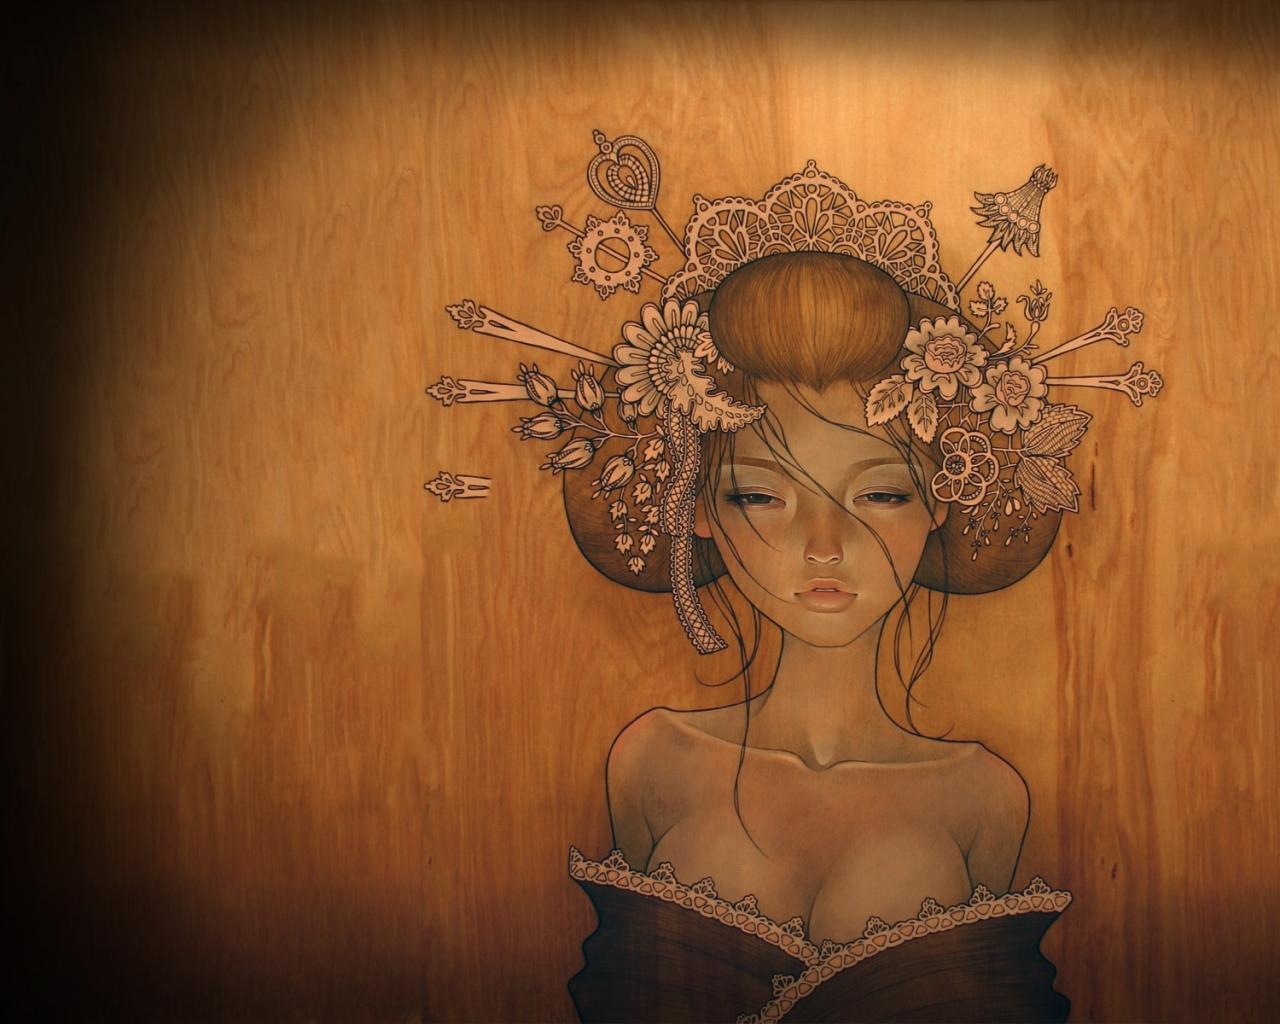 audrey kawasaki artwork 1920x1200 wallpaper Wallpaper 1280x1024